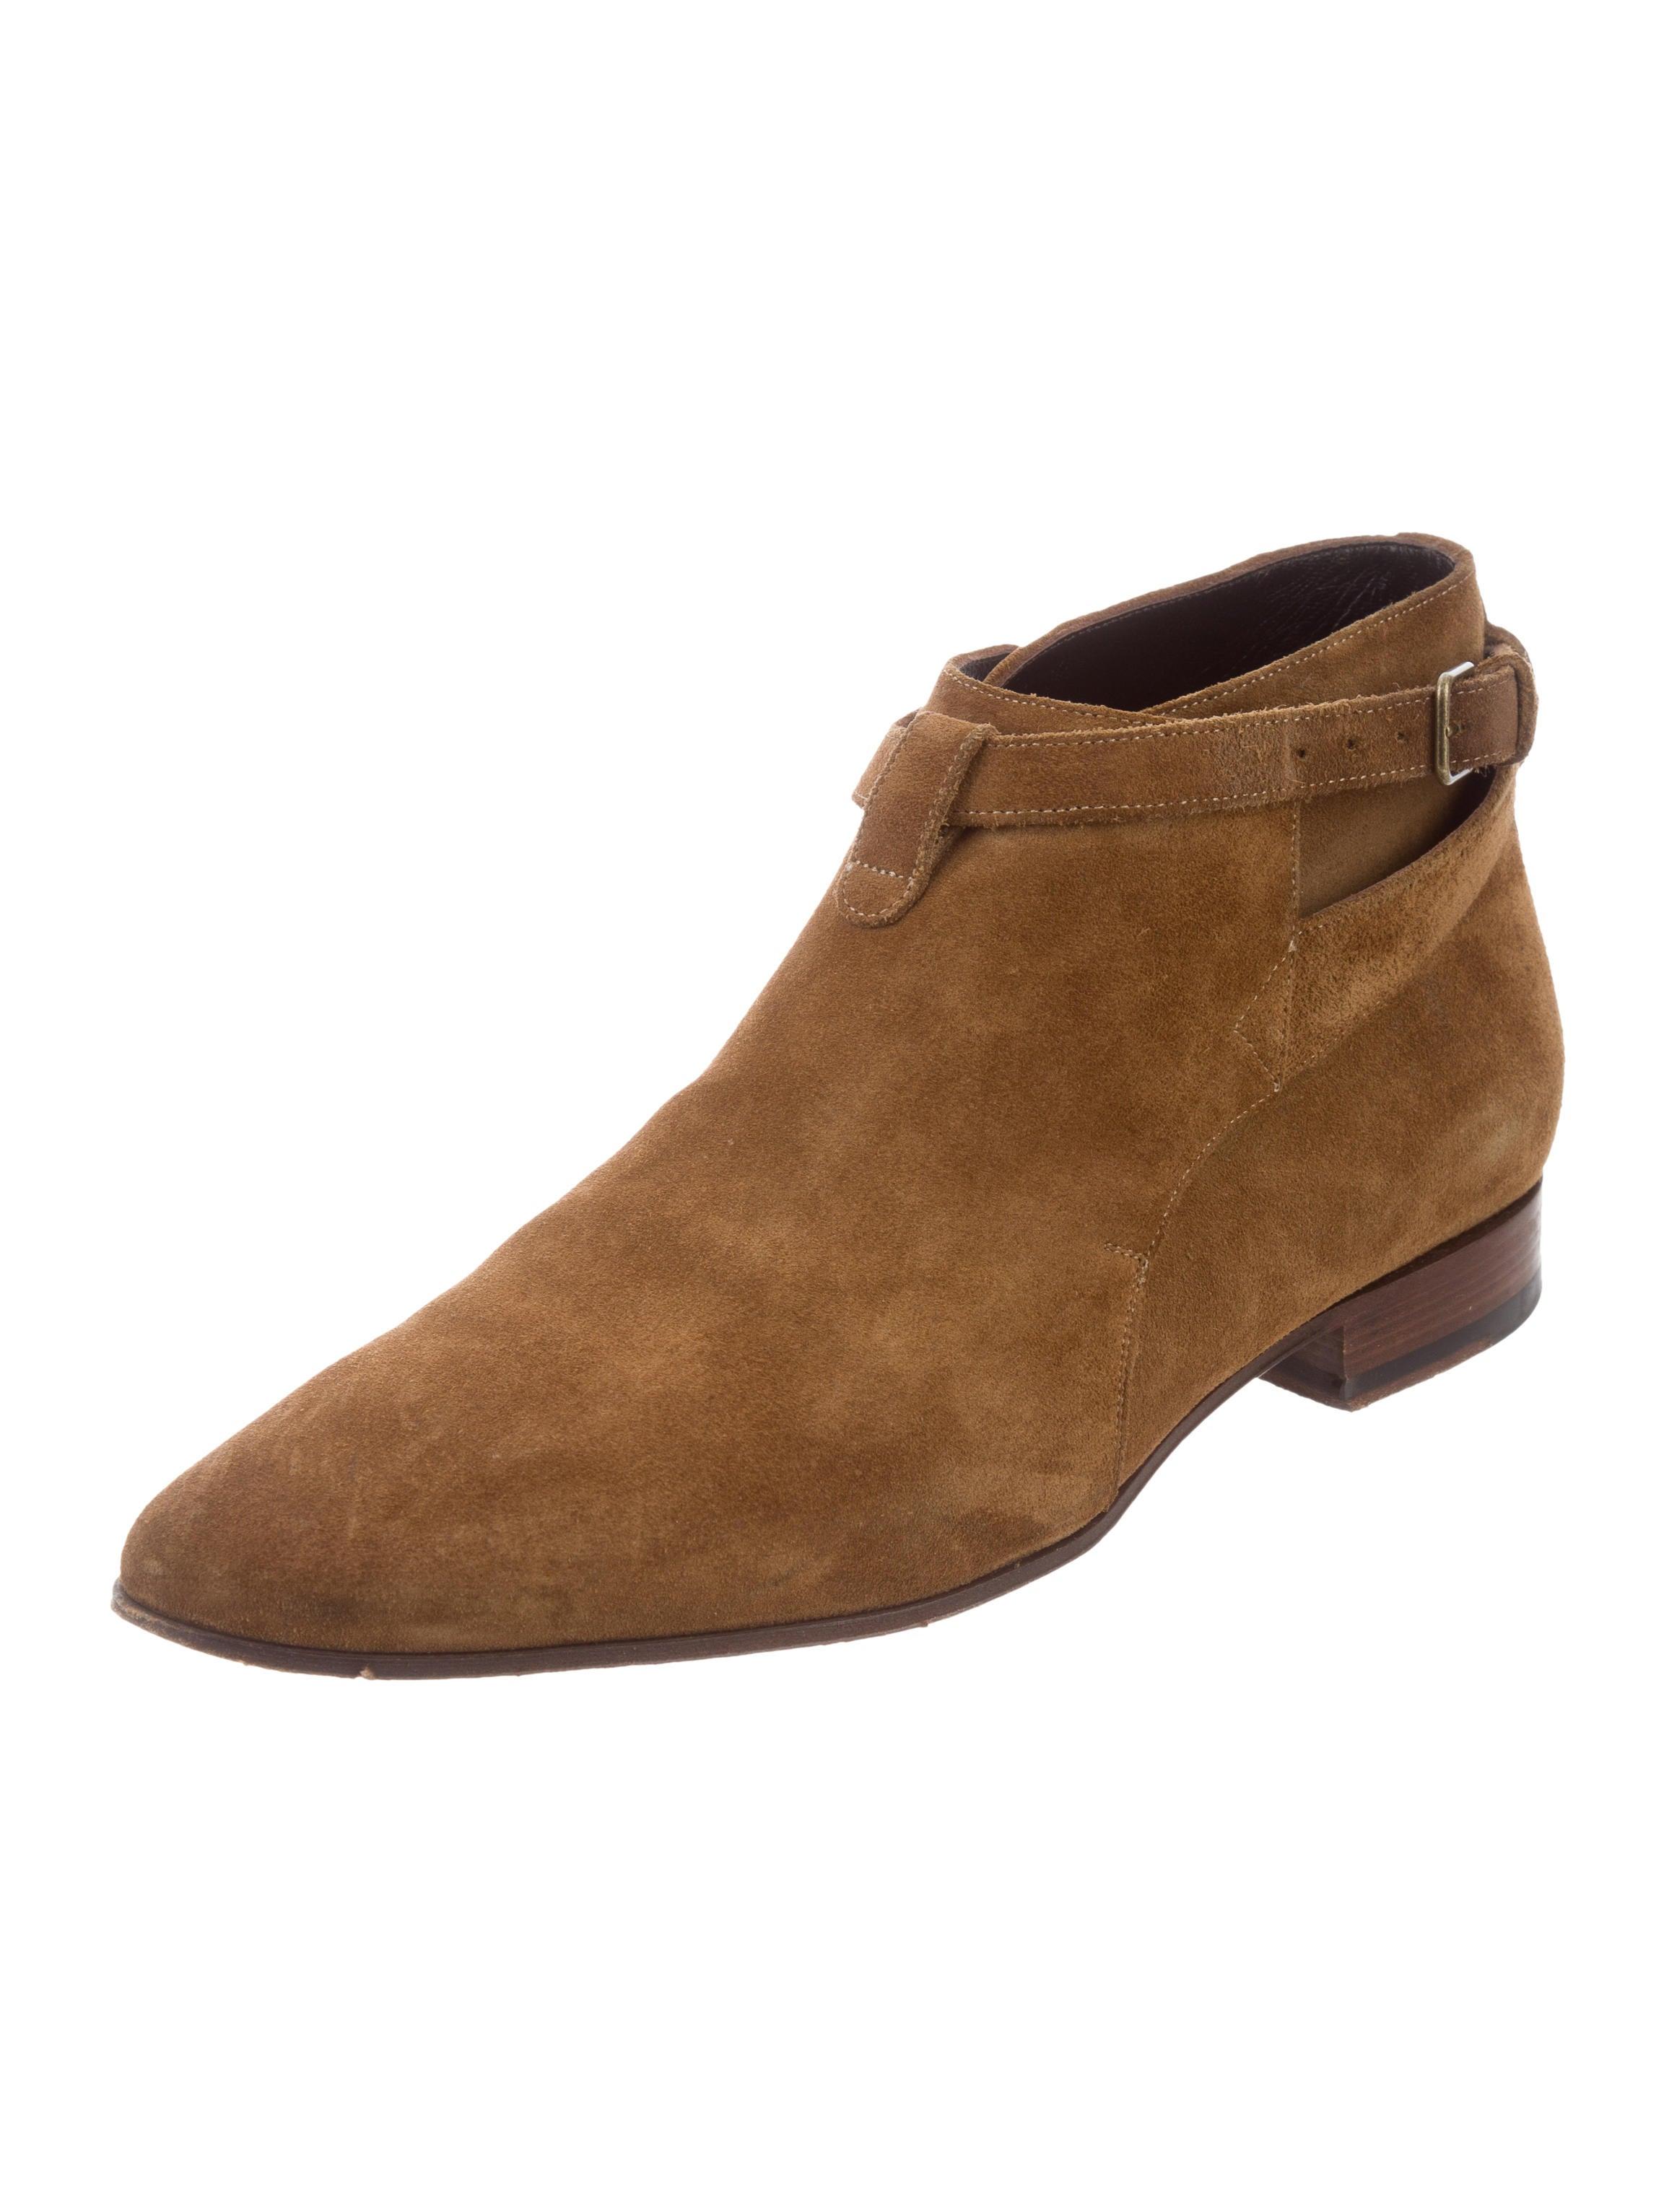 laurent jodhpur suede buckle ankle boots shoes